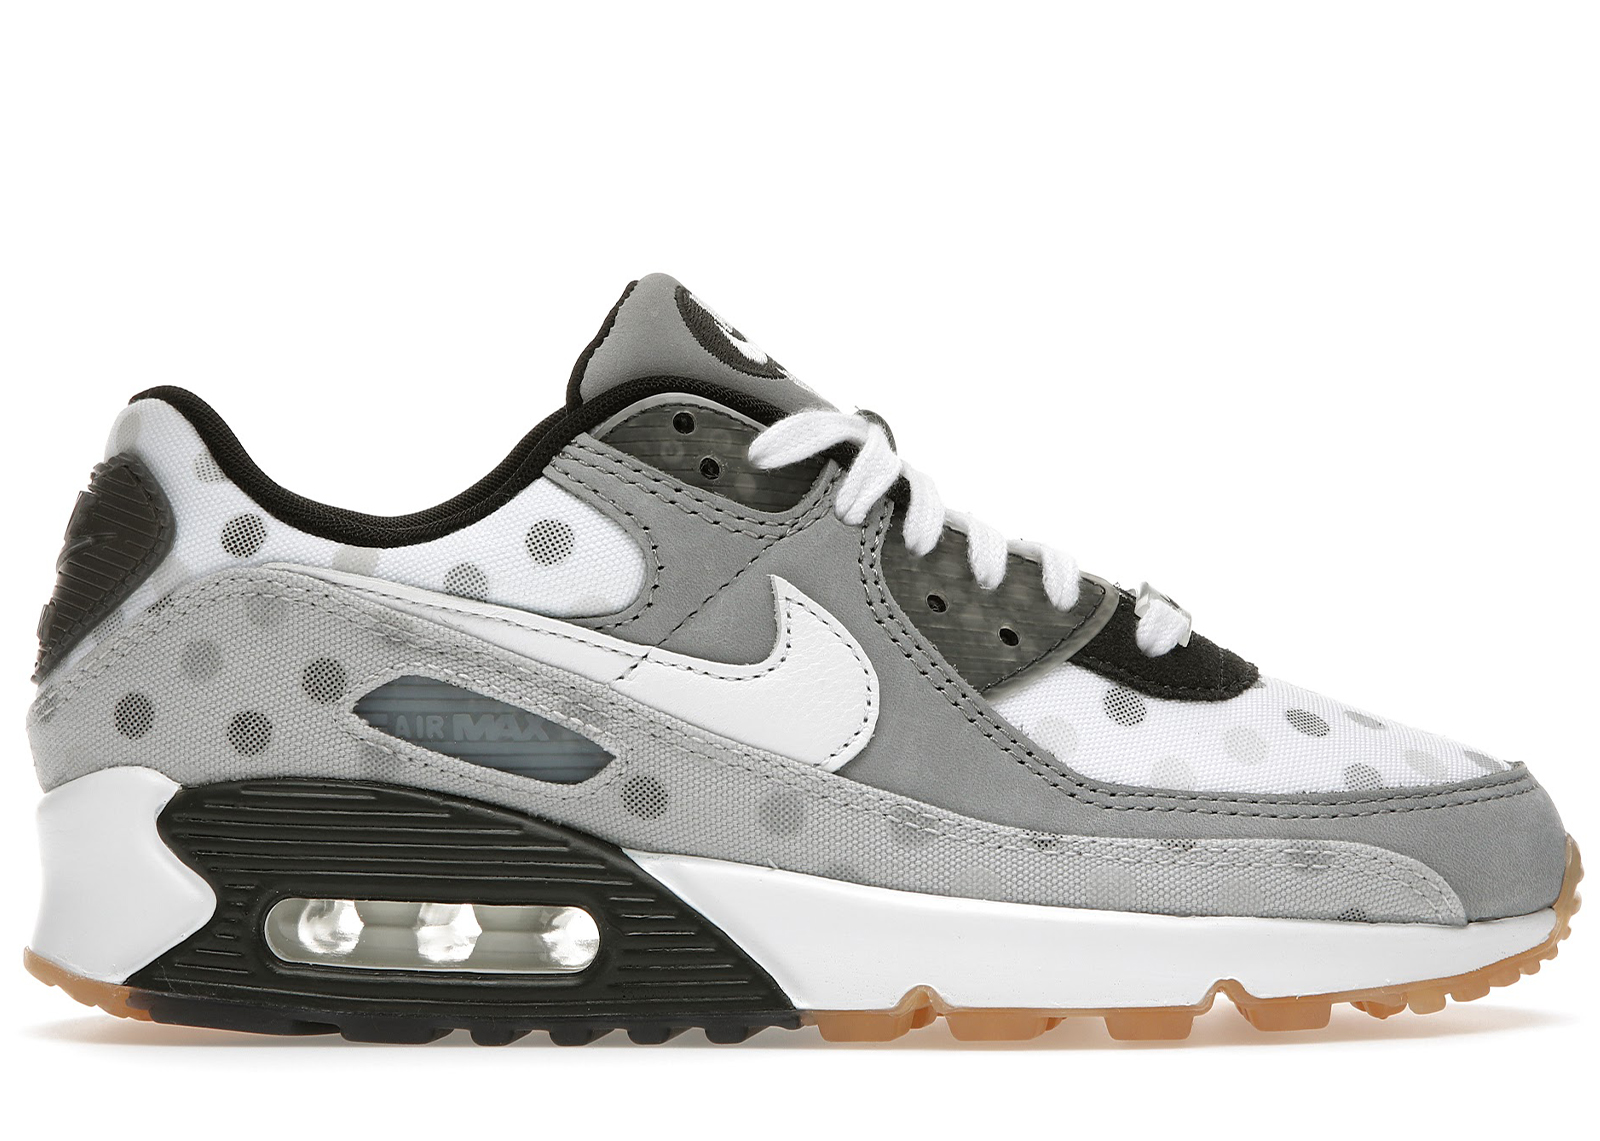 Acheter Nike Air Max 90 Chaussures et sneakers neuves